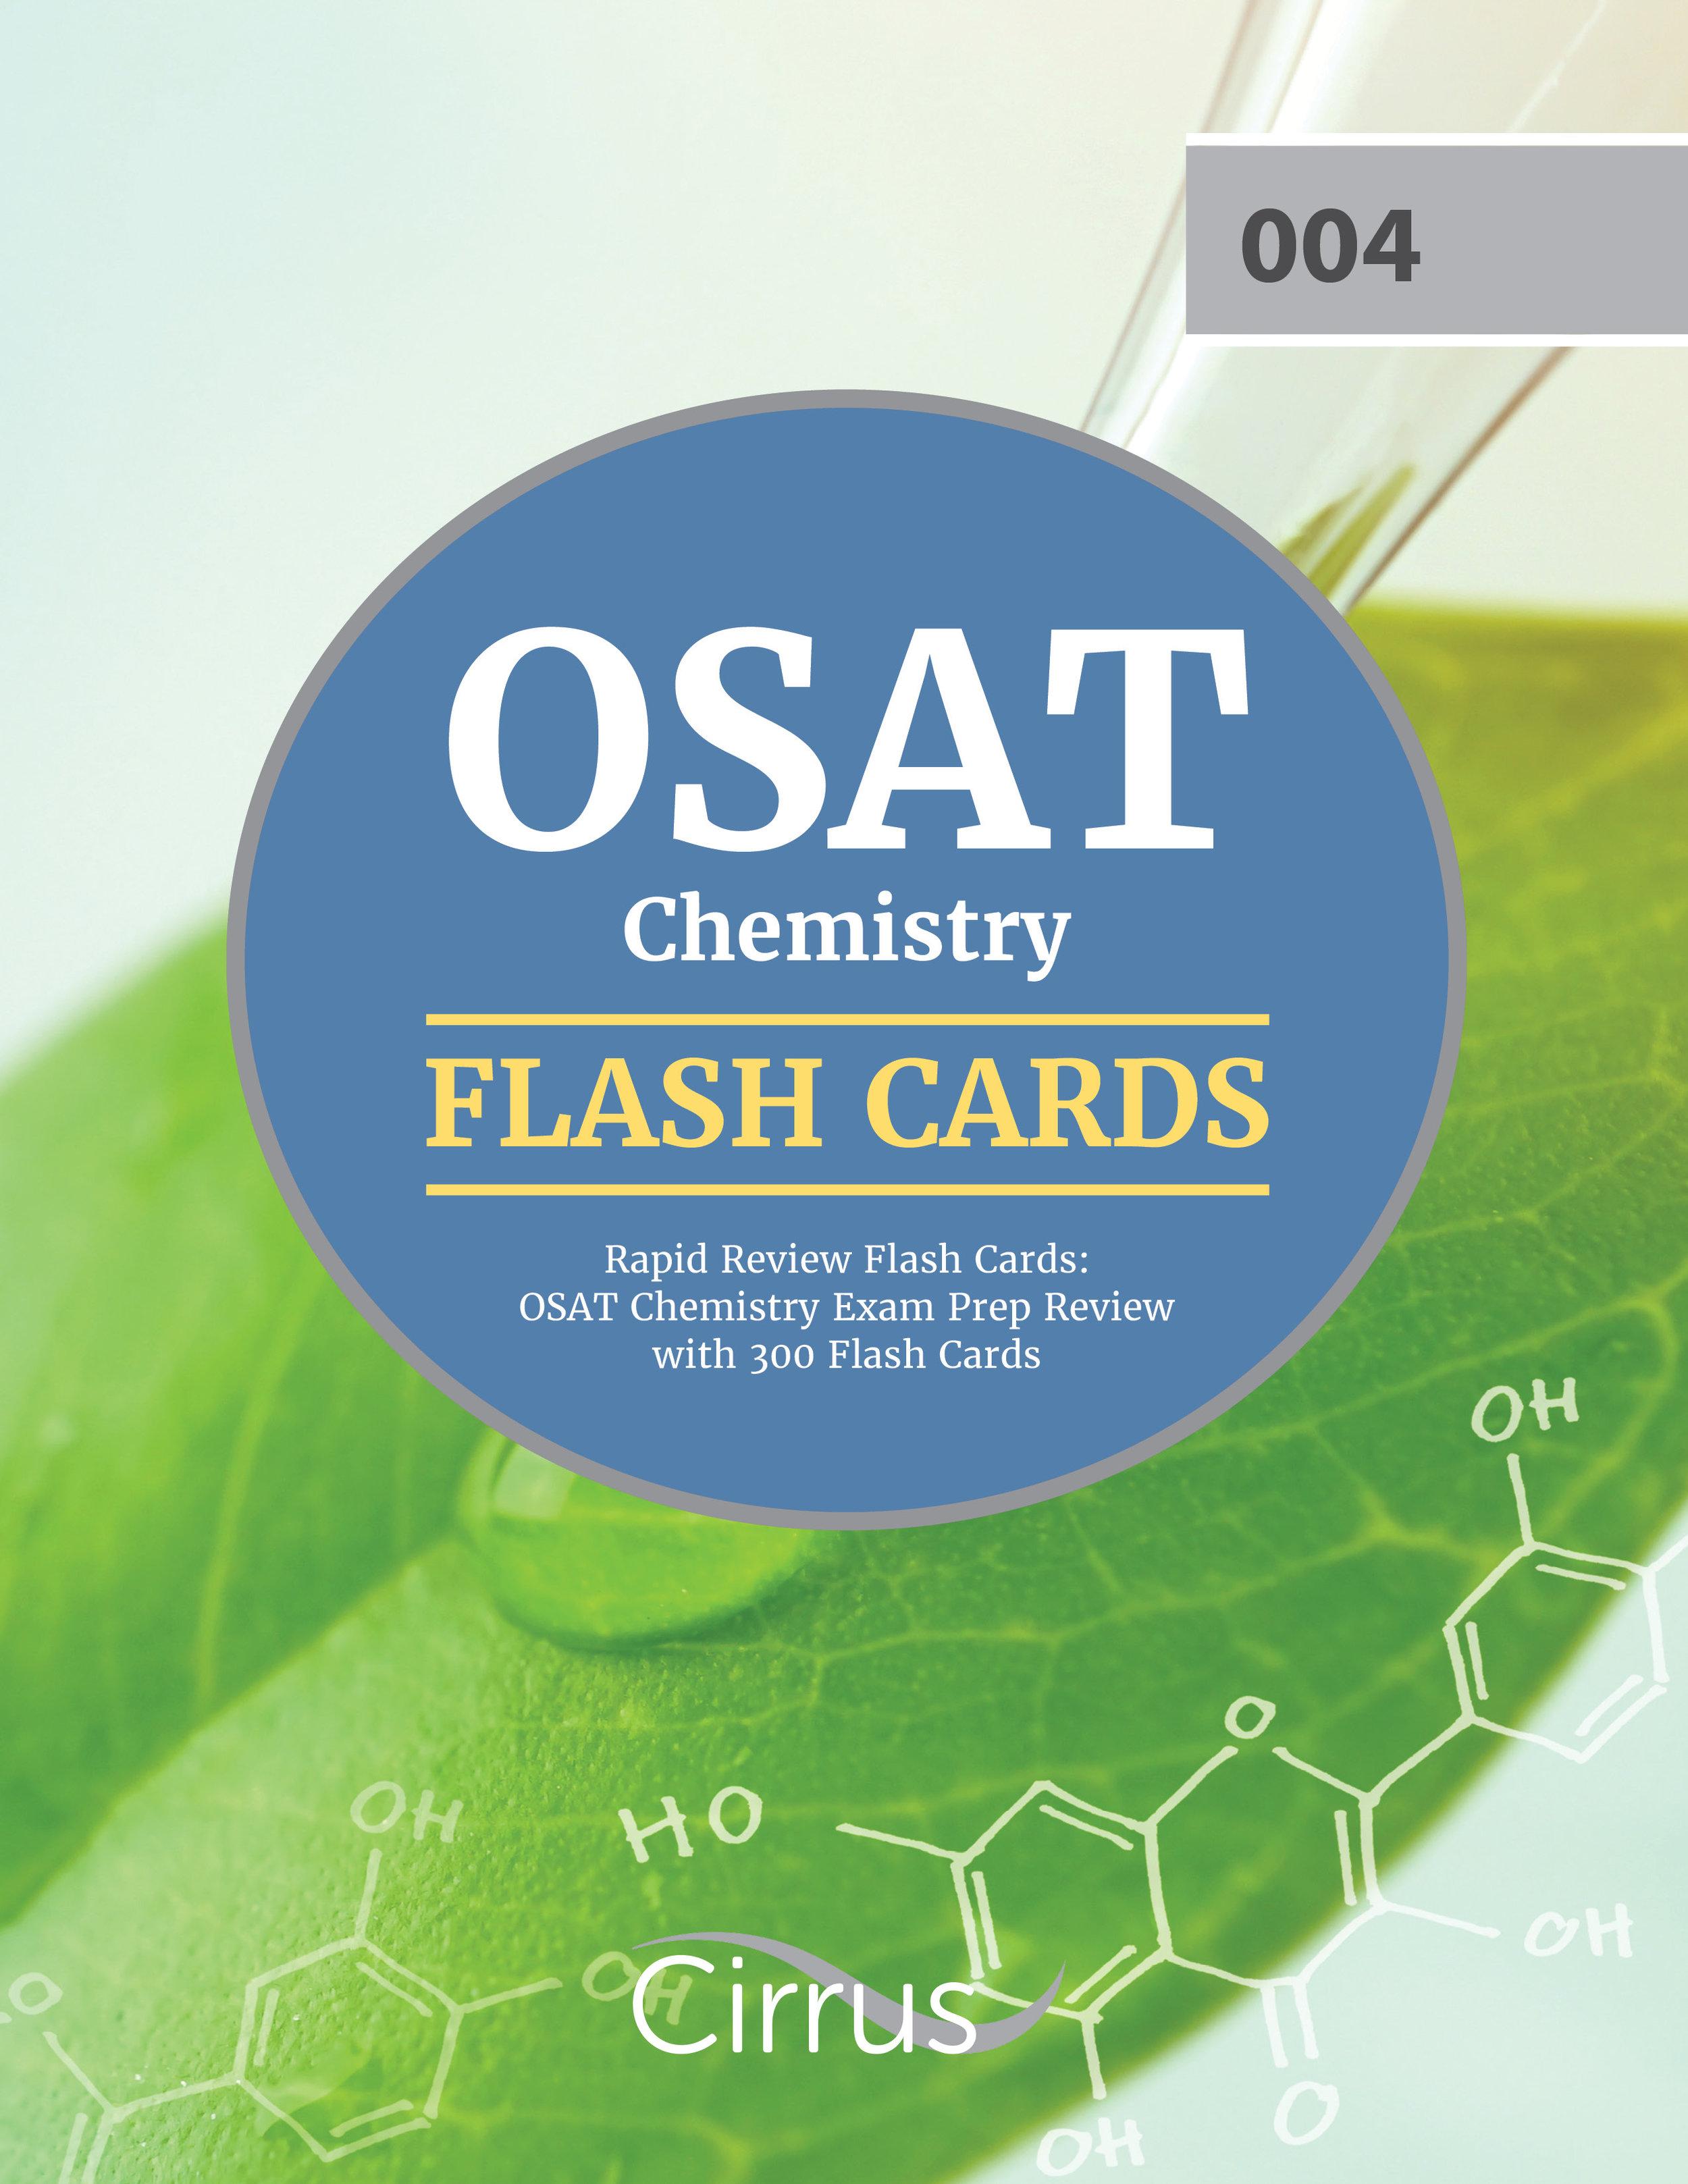 OSAT Chemistry Flash Cards